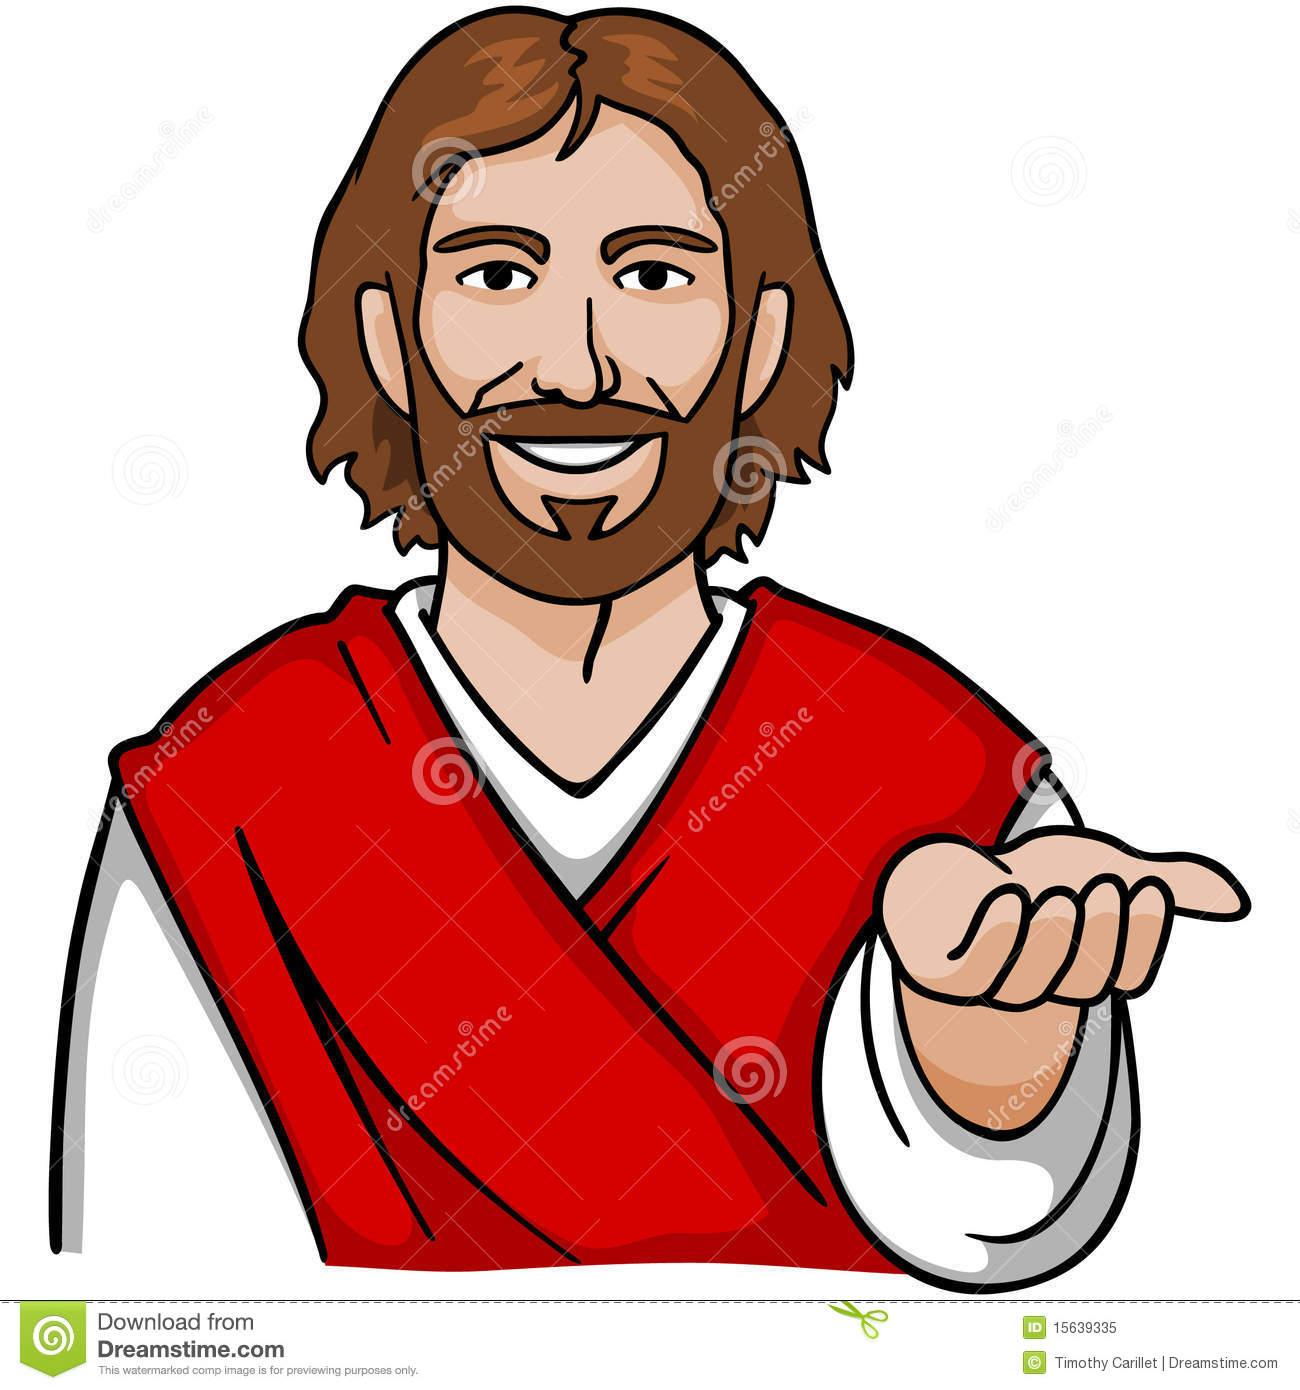 Jesus Clip Art & Look At Clip Art Images.